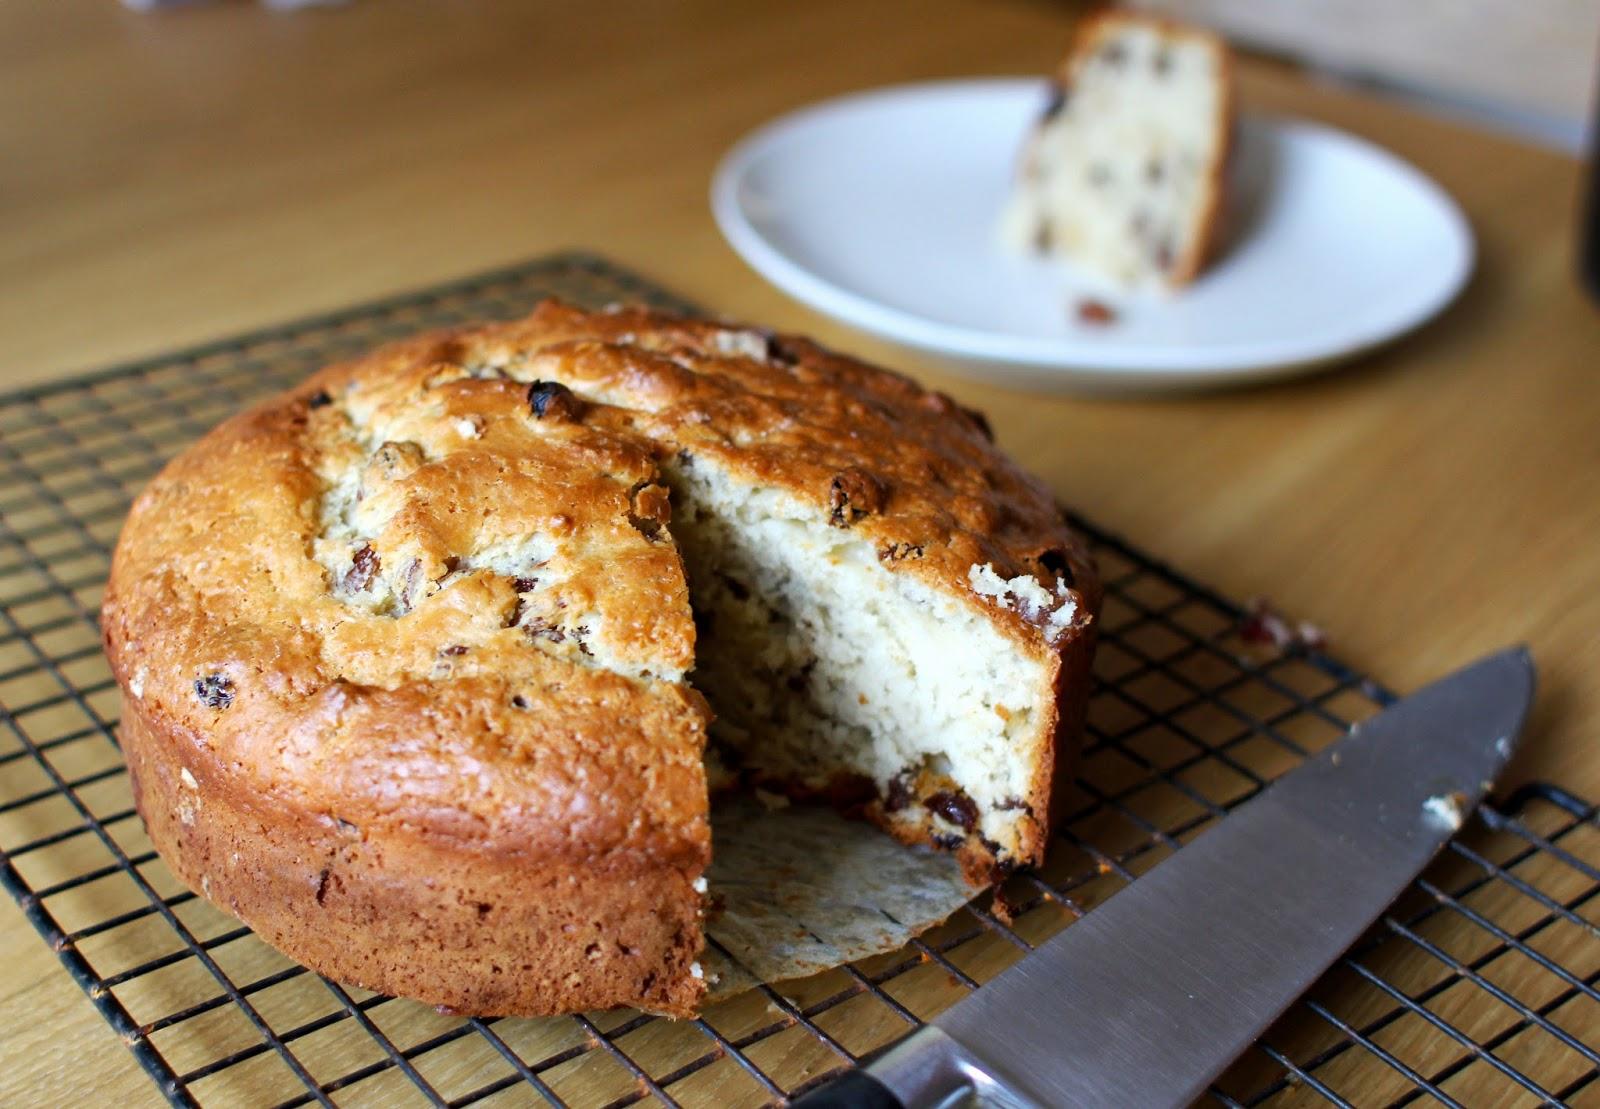 Low Fat Cake Recipes With Yogurt Uk: Mamacook: Low Sugar Yogurt Cake For The Whole Family